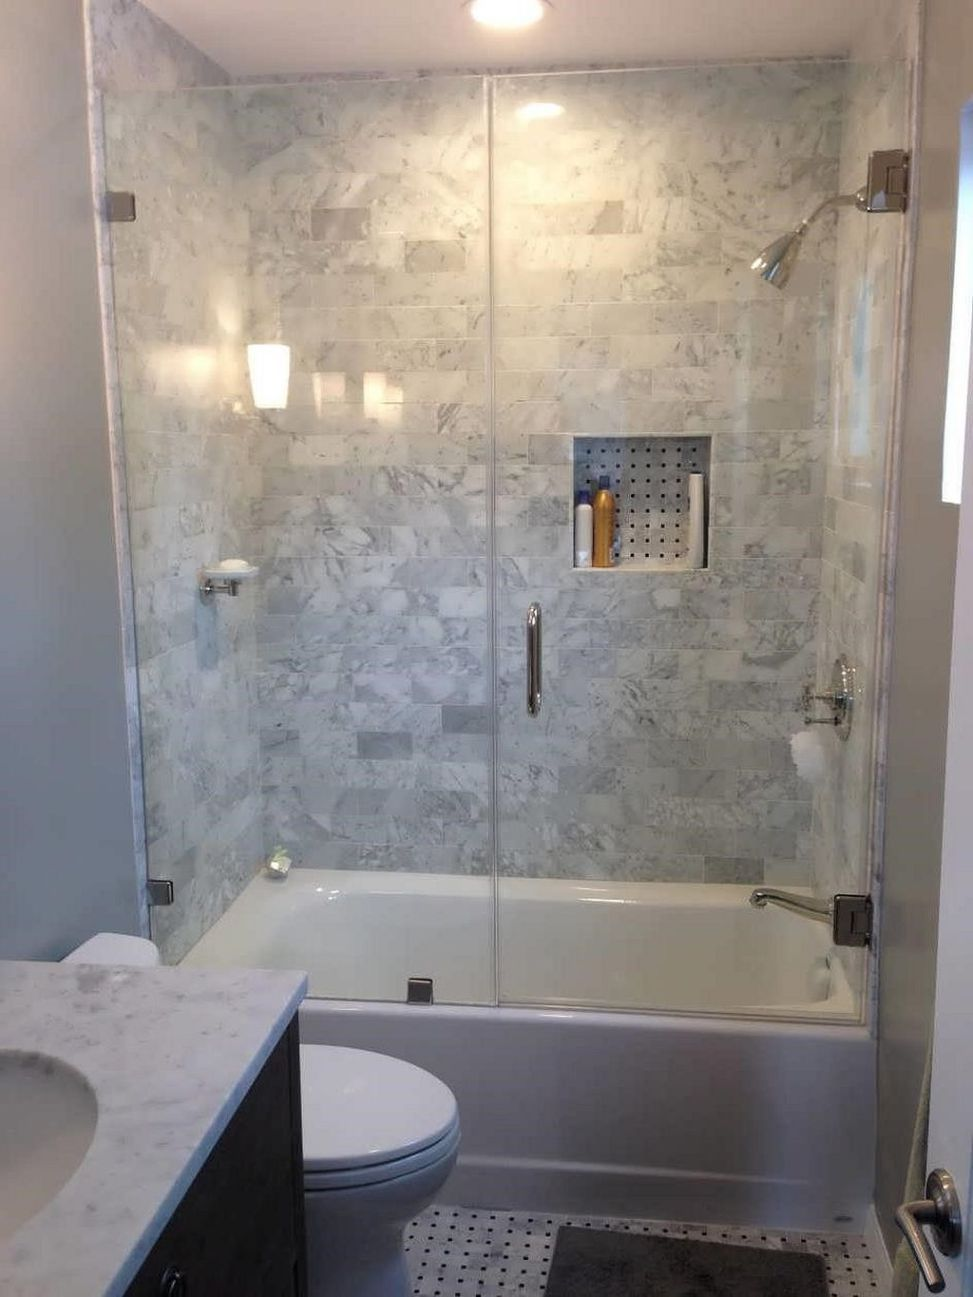 Tiny Bathroom Tub Shower Combo Remodeling Ideas 56 Bathroom Tub Shower Combo Bathroom Design Small Bathroom Remodel Master